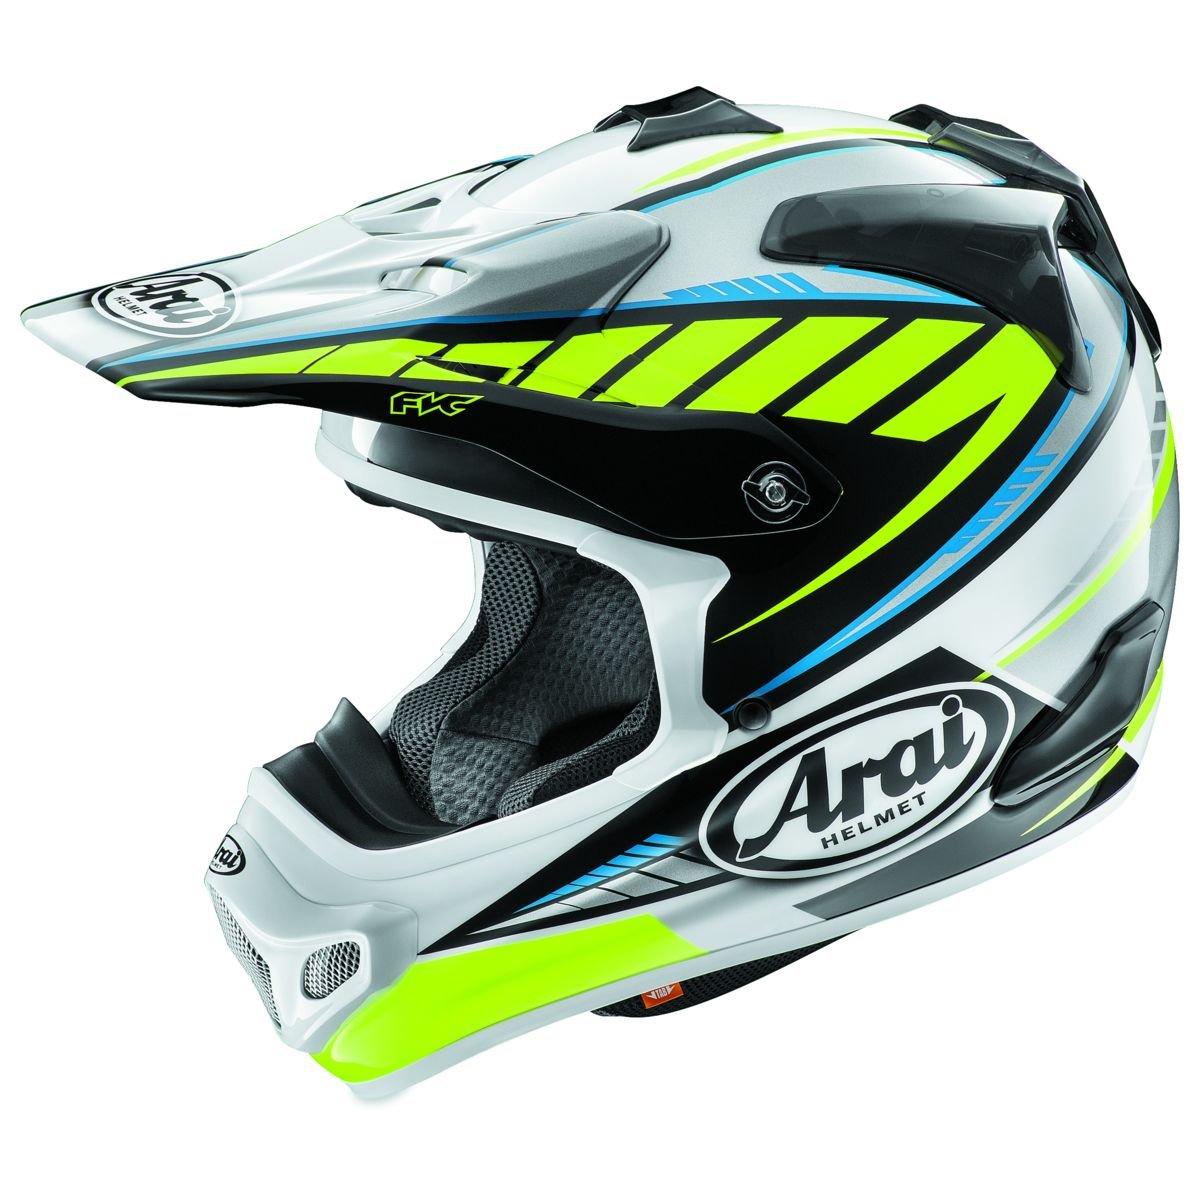 Amazon.com: Arai VX-Pro 4 Spike Yellow Motocross Helmet - Small: Automotive